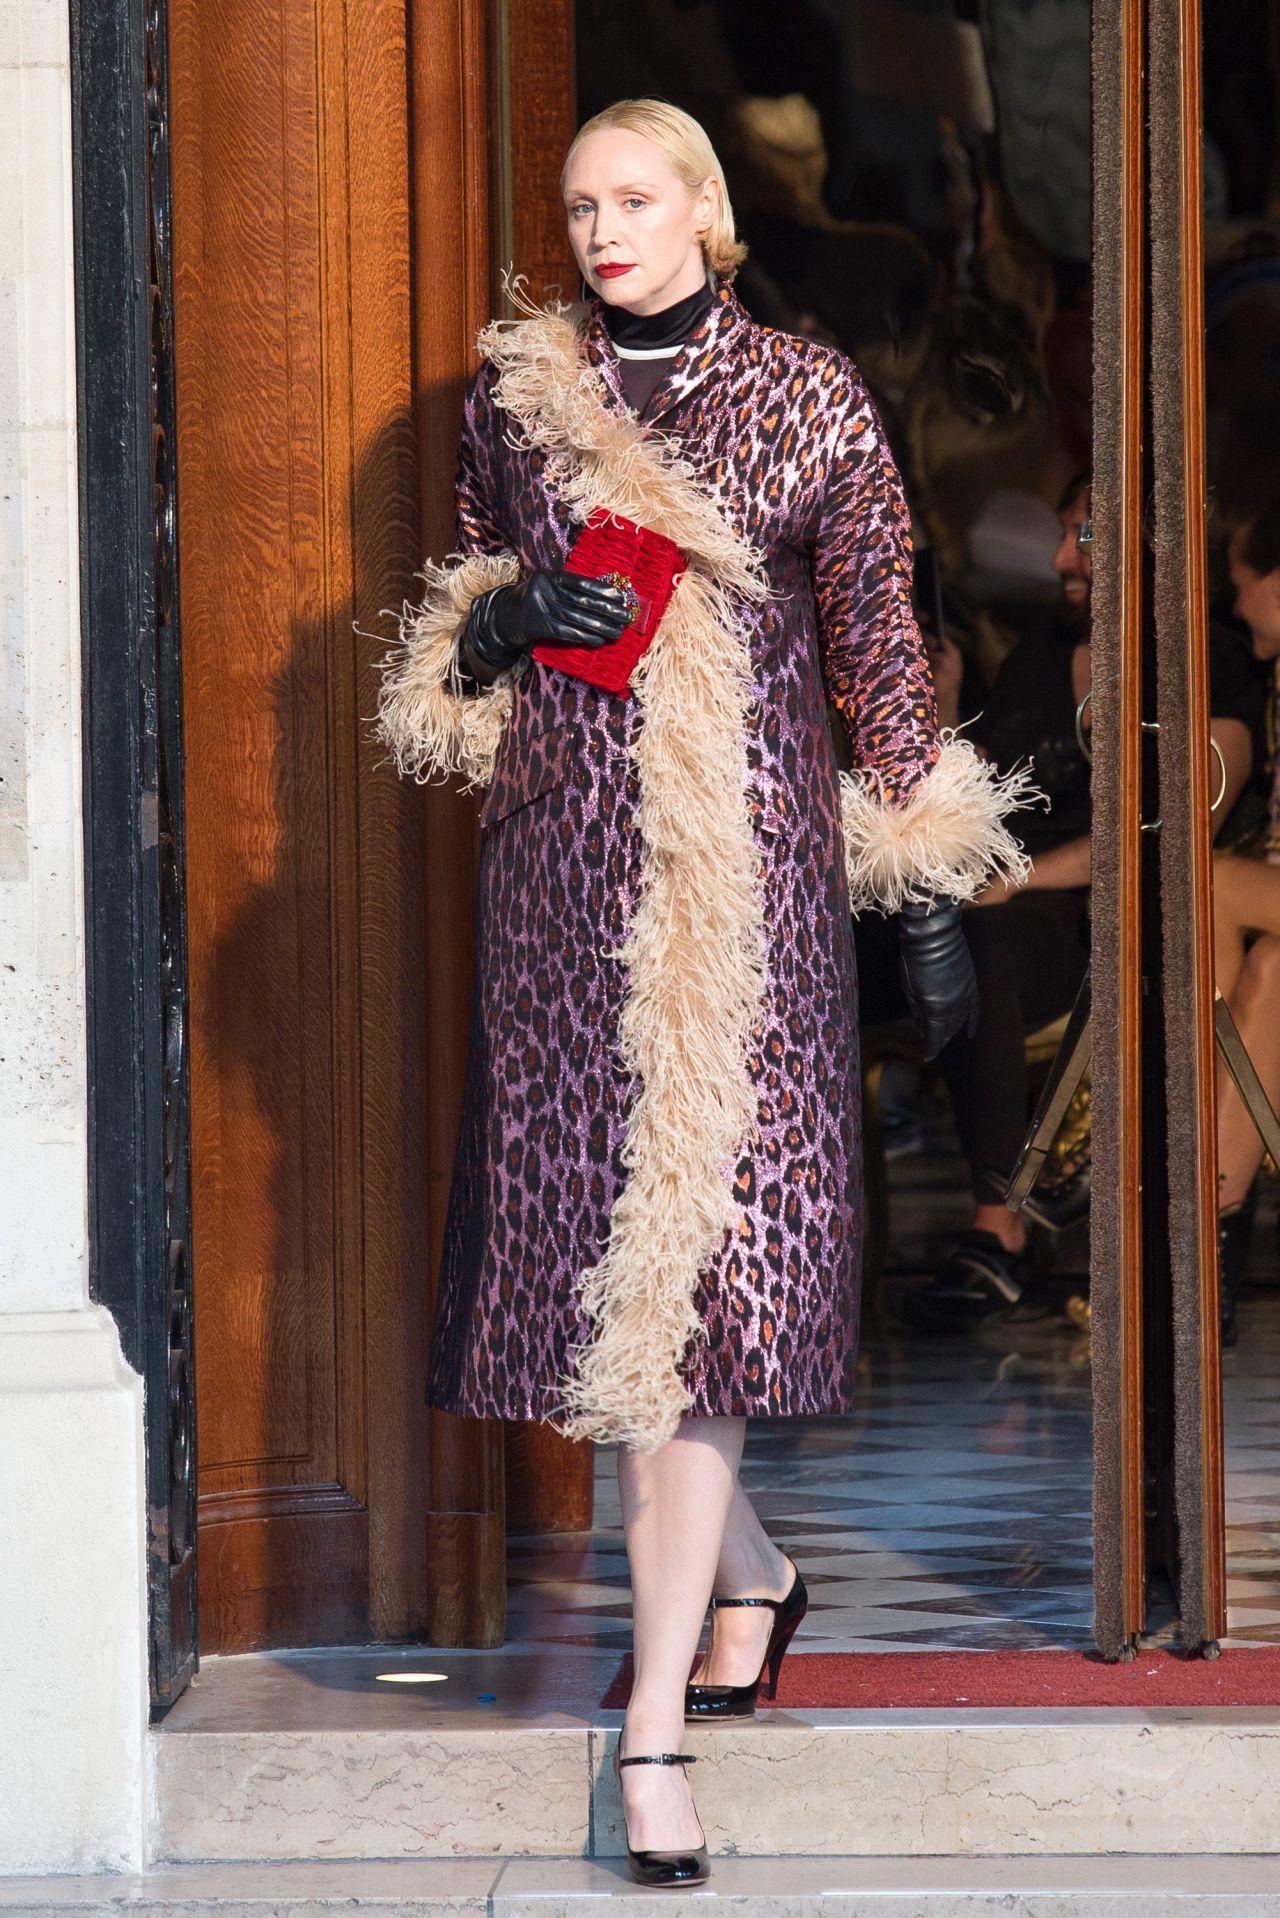 Gwendoline Christie Paris Haute Couture Miu Miu 2019 Cruise Collection Show